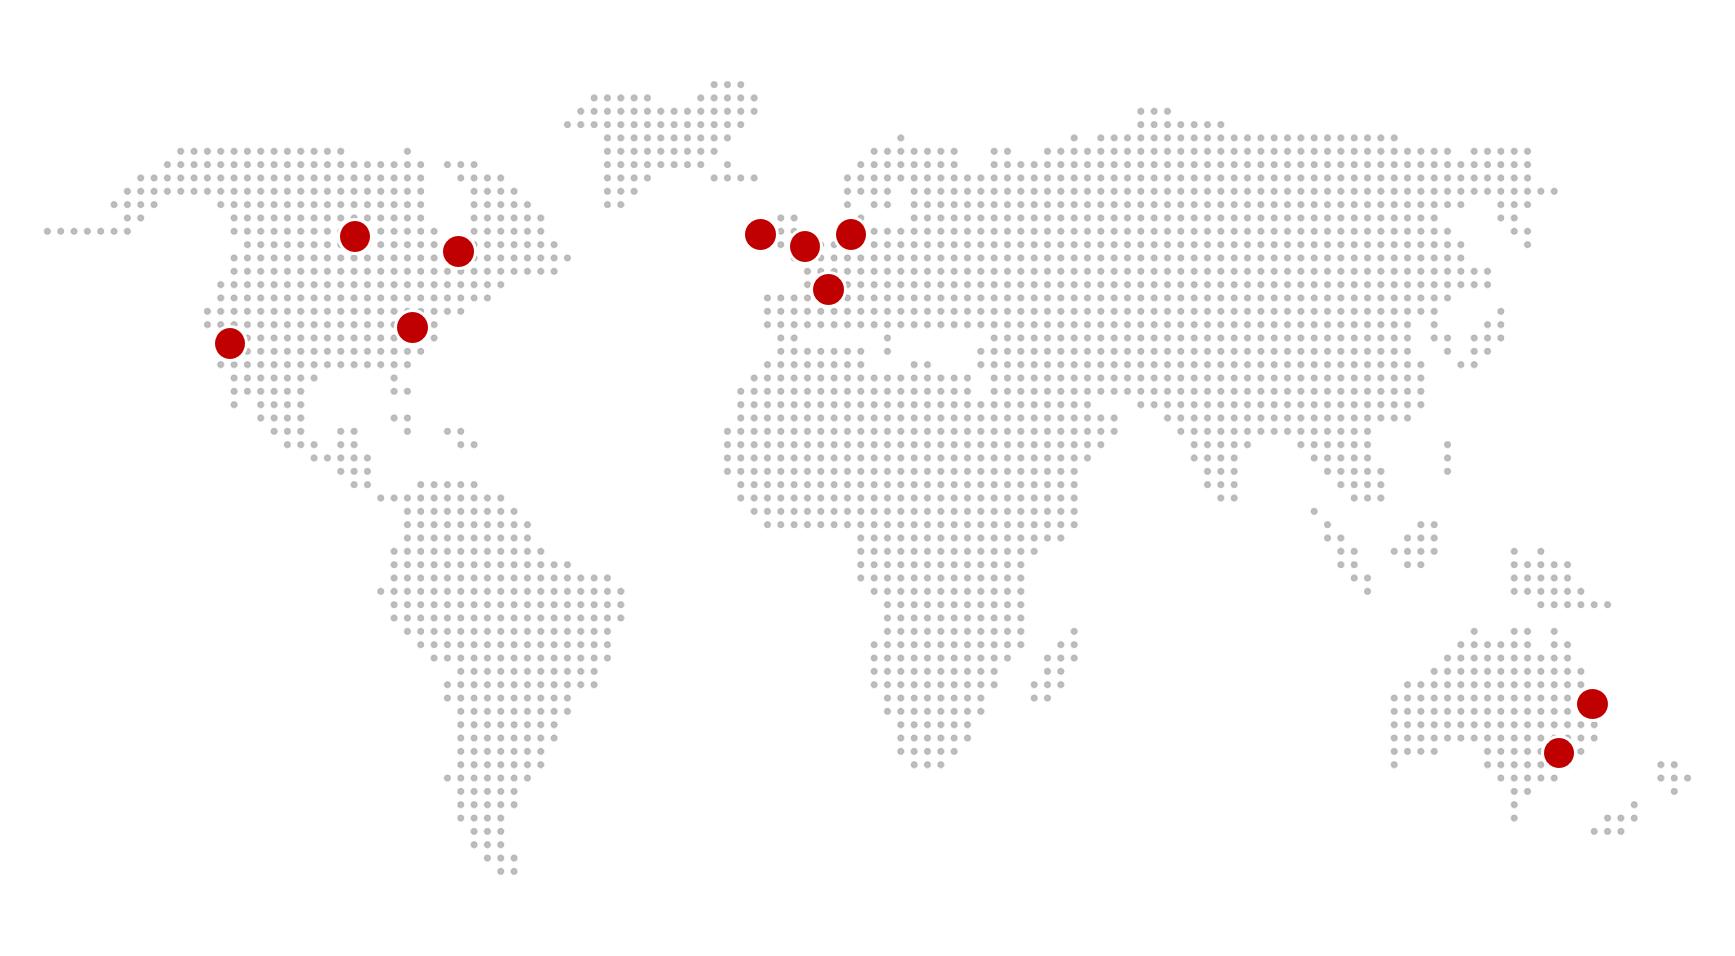 company-trustcenter-datacentersmap